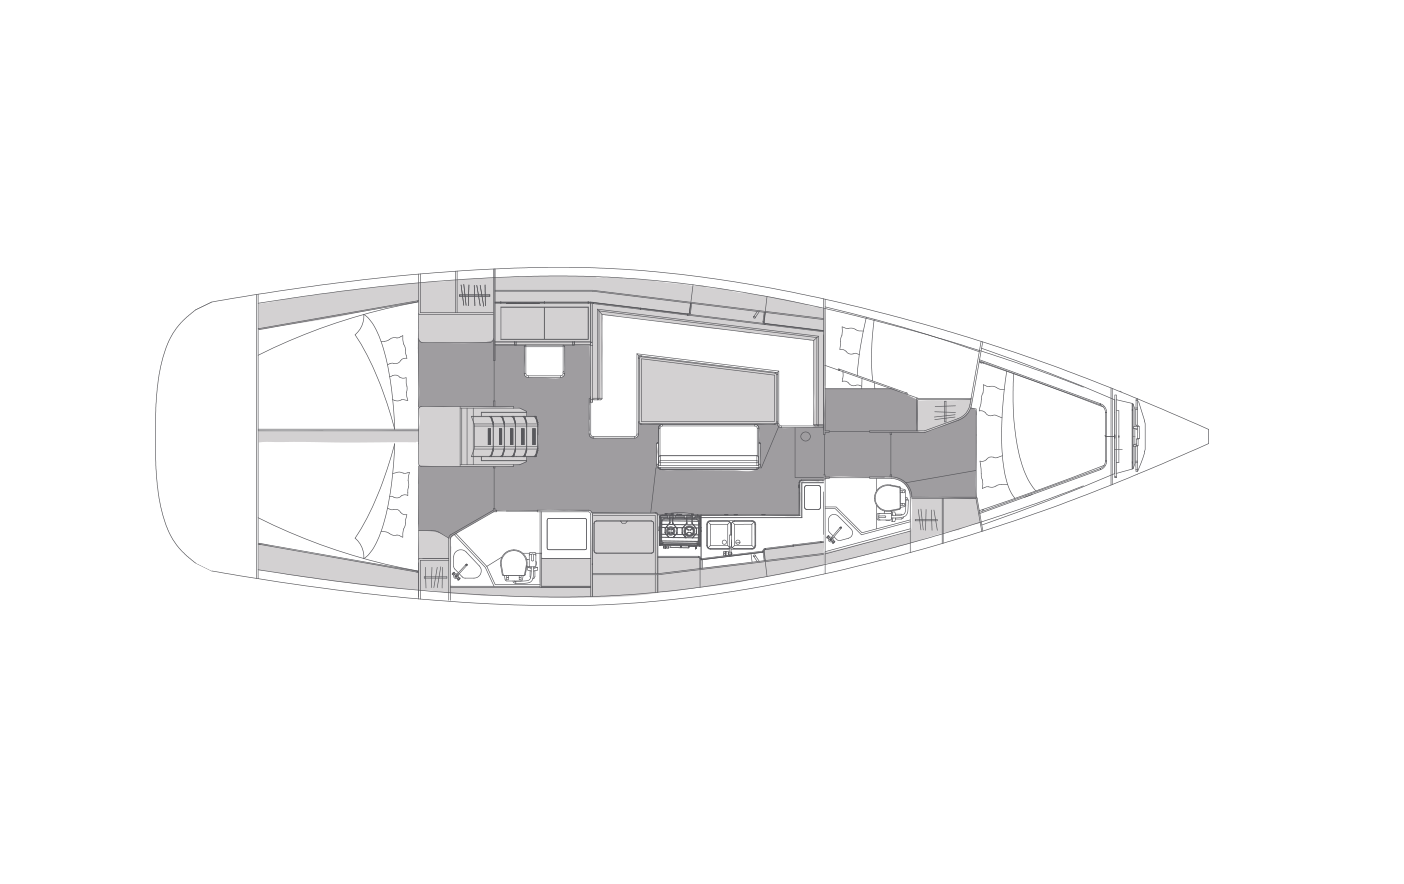 i45 - 4 cabins & 2 heads